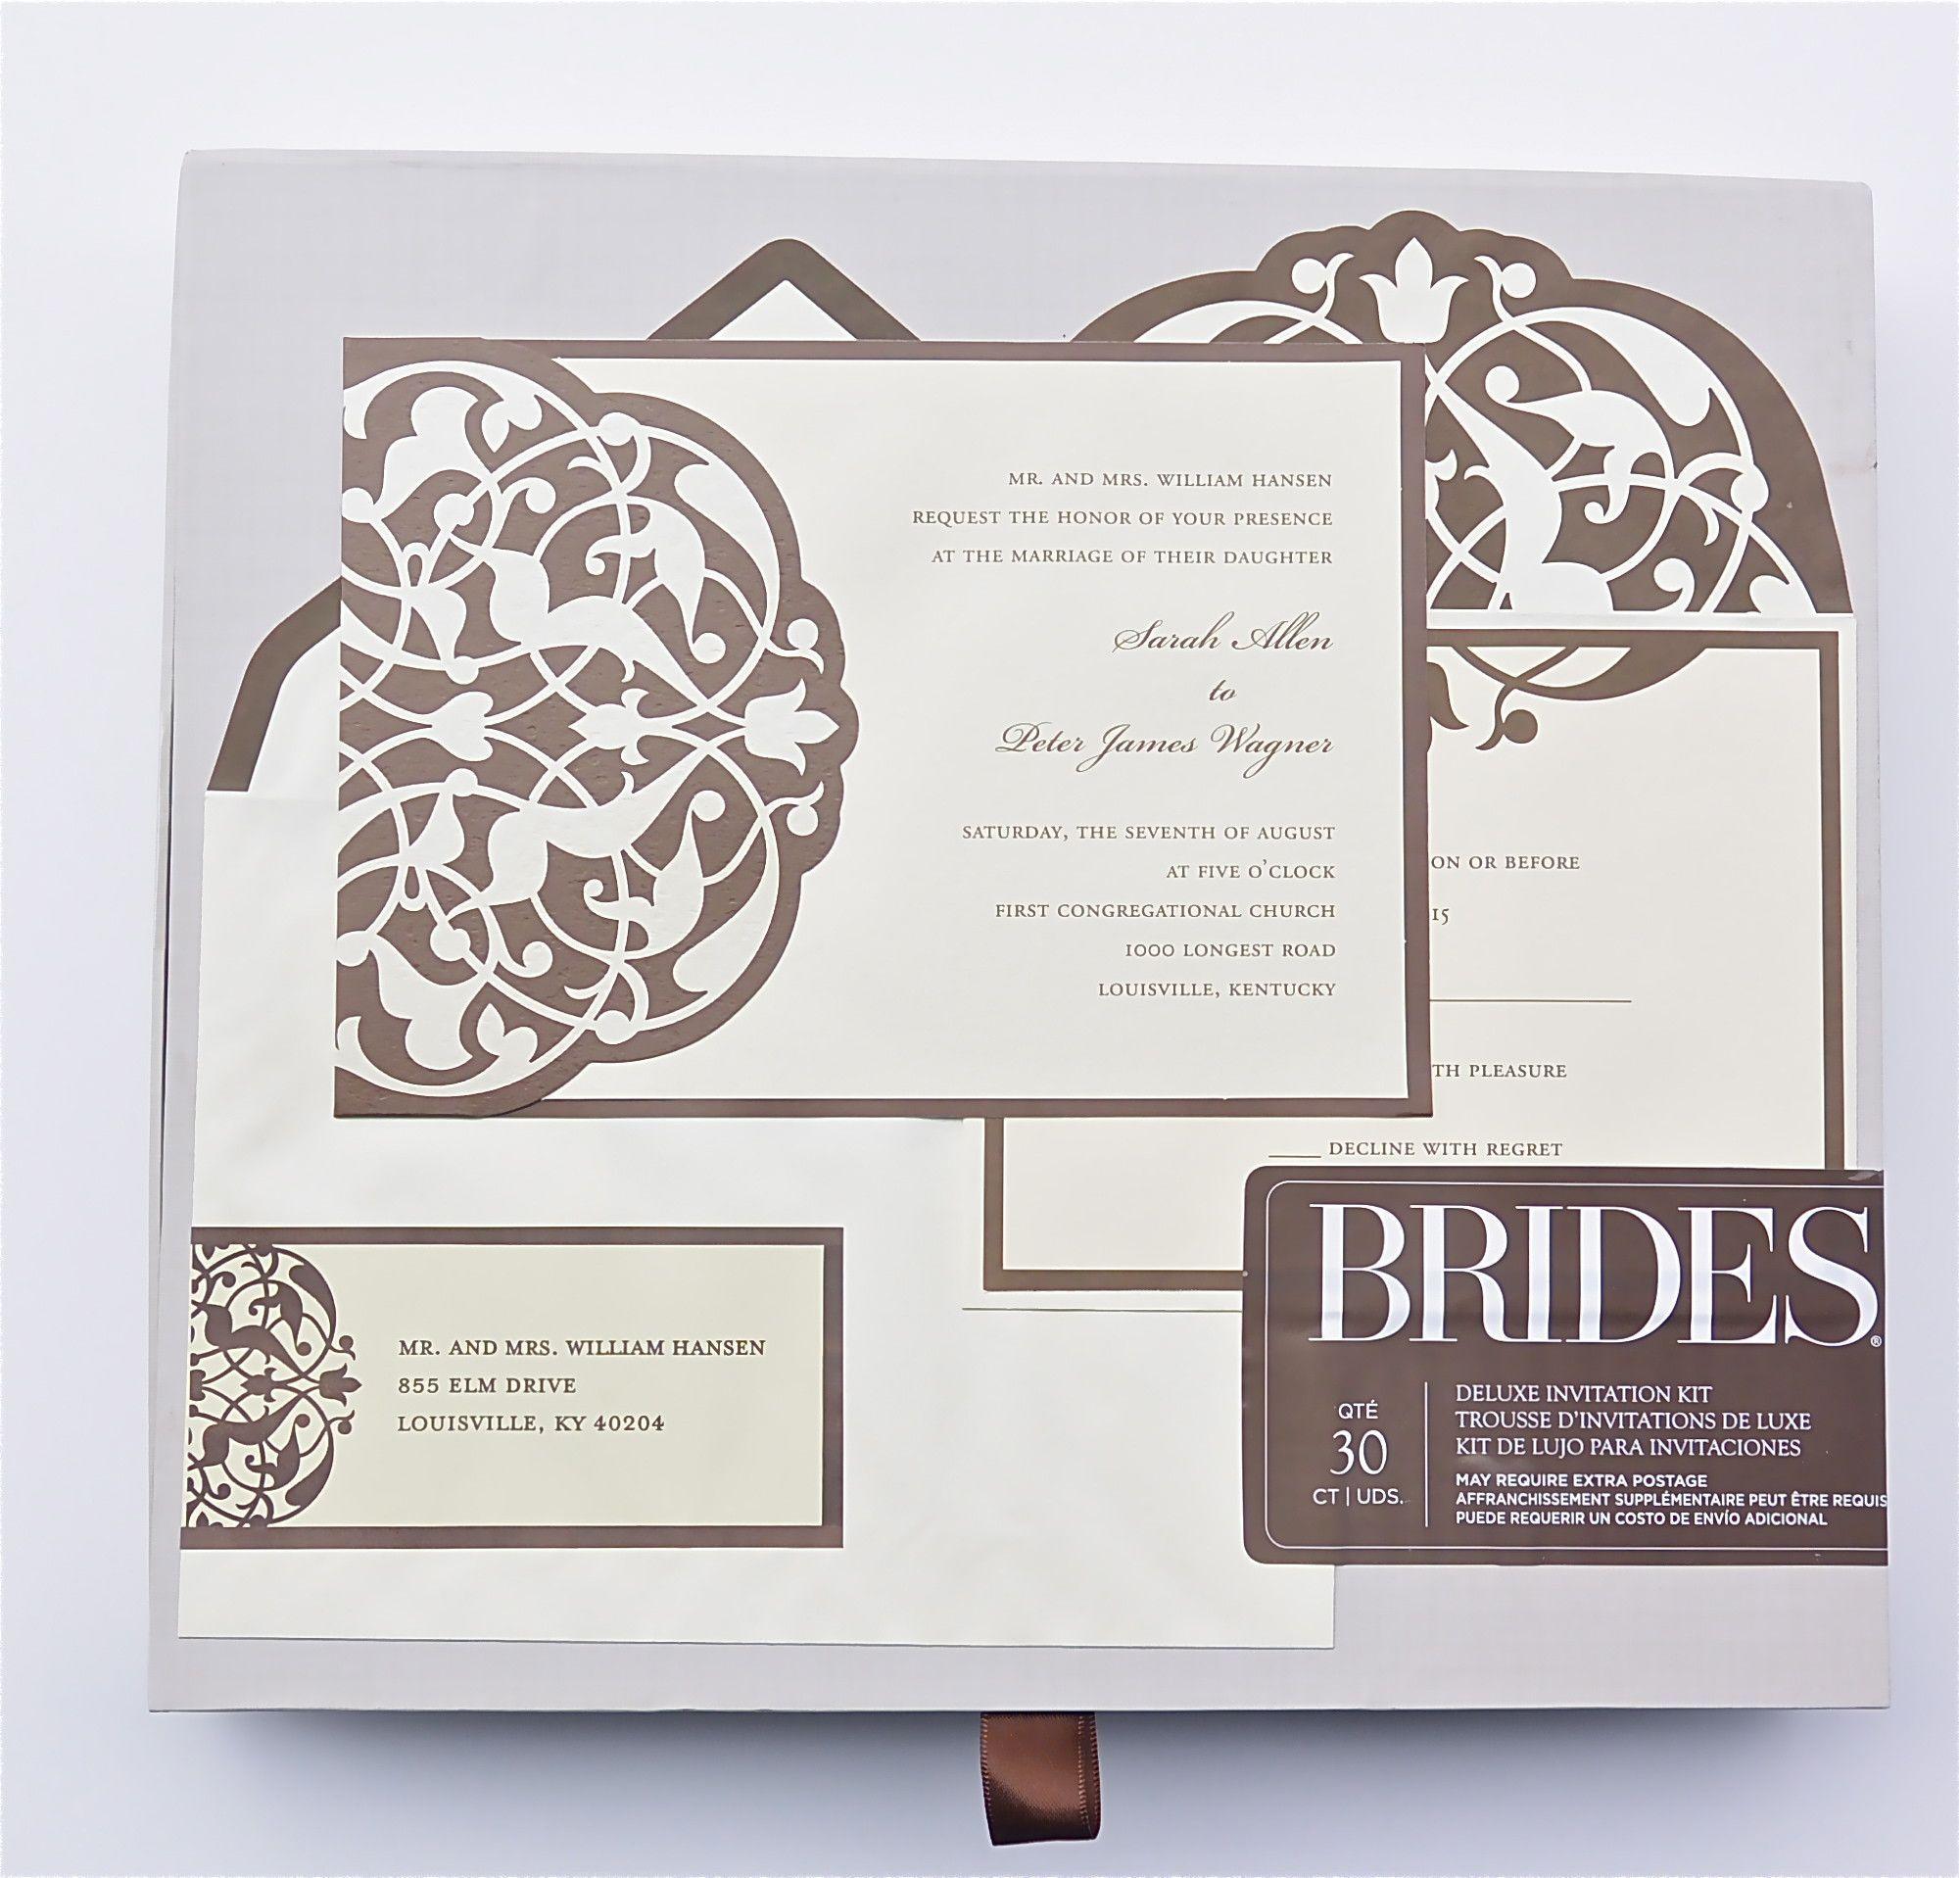 Brides Wedding Invitation Kit: Brides Deluxe Invitation Kit